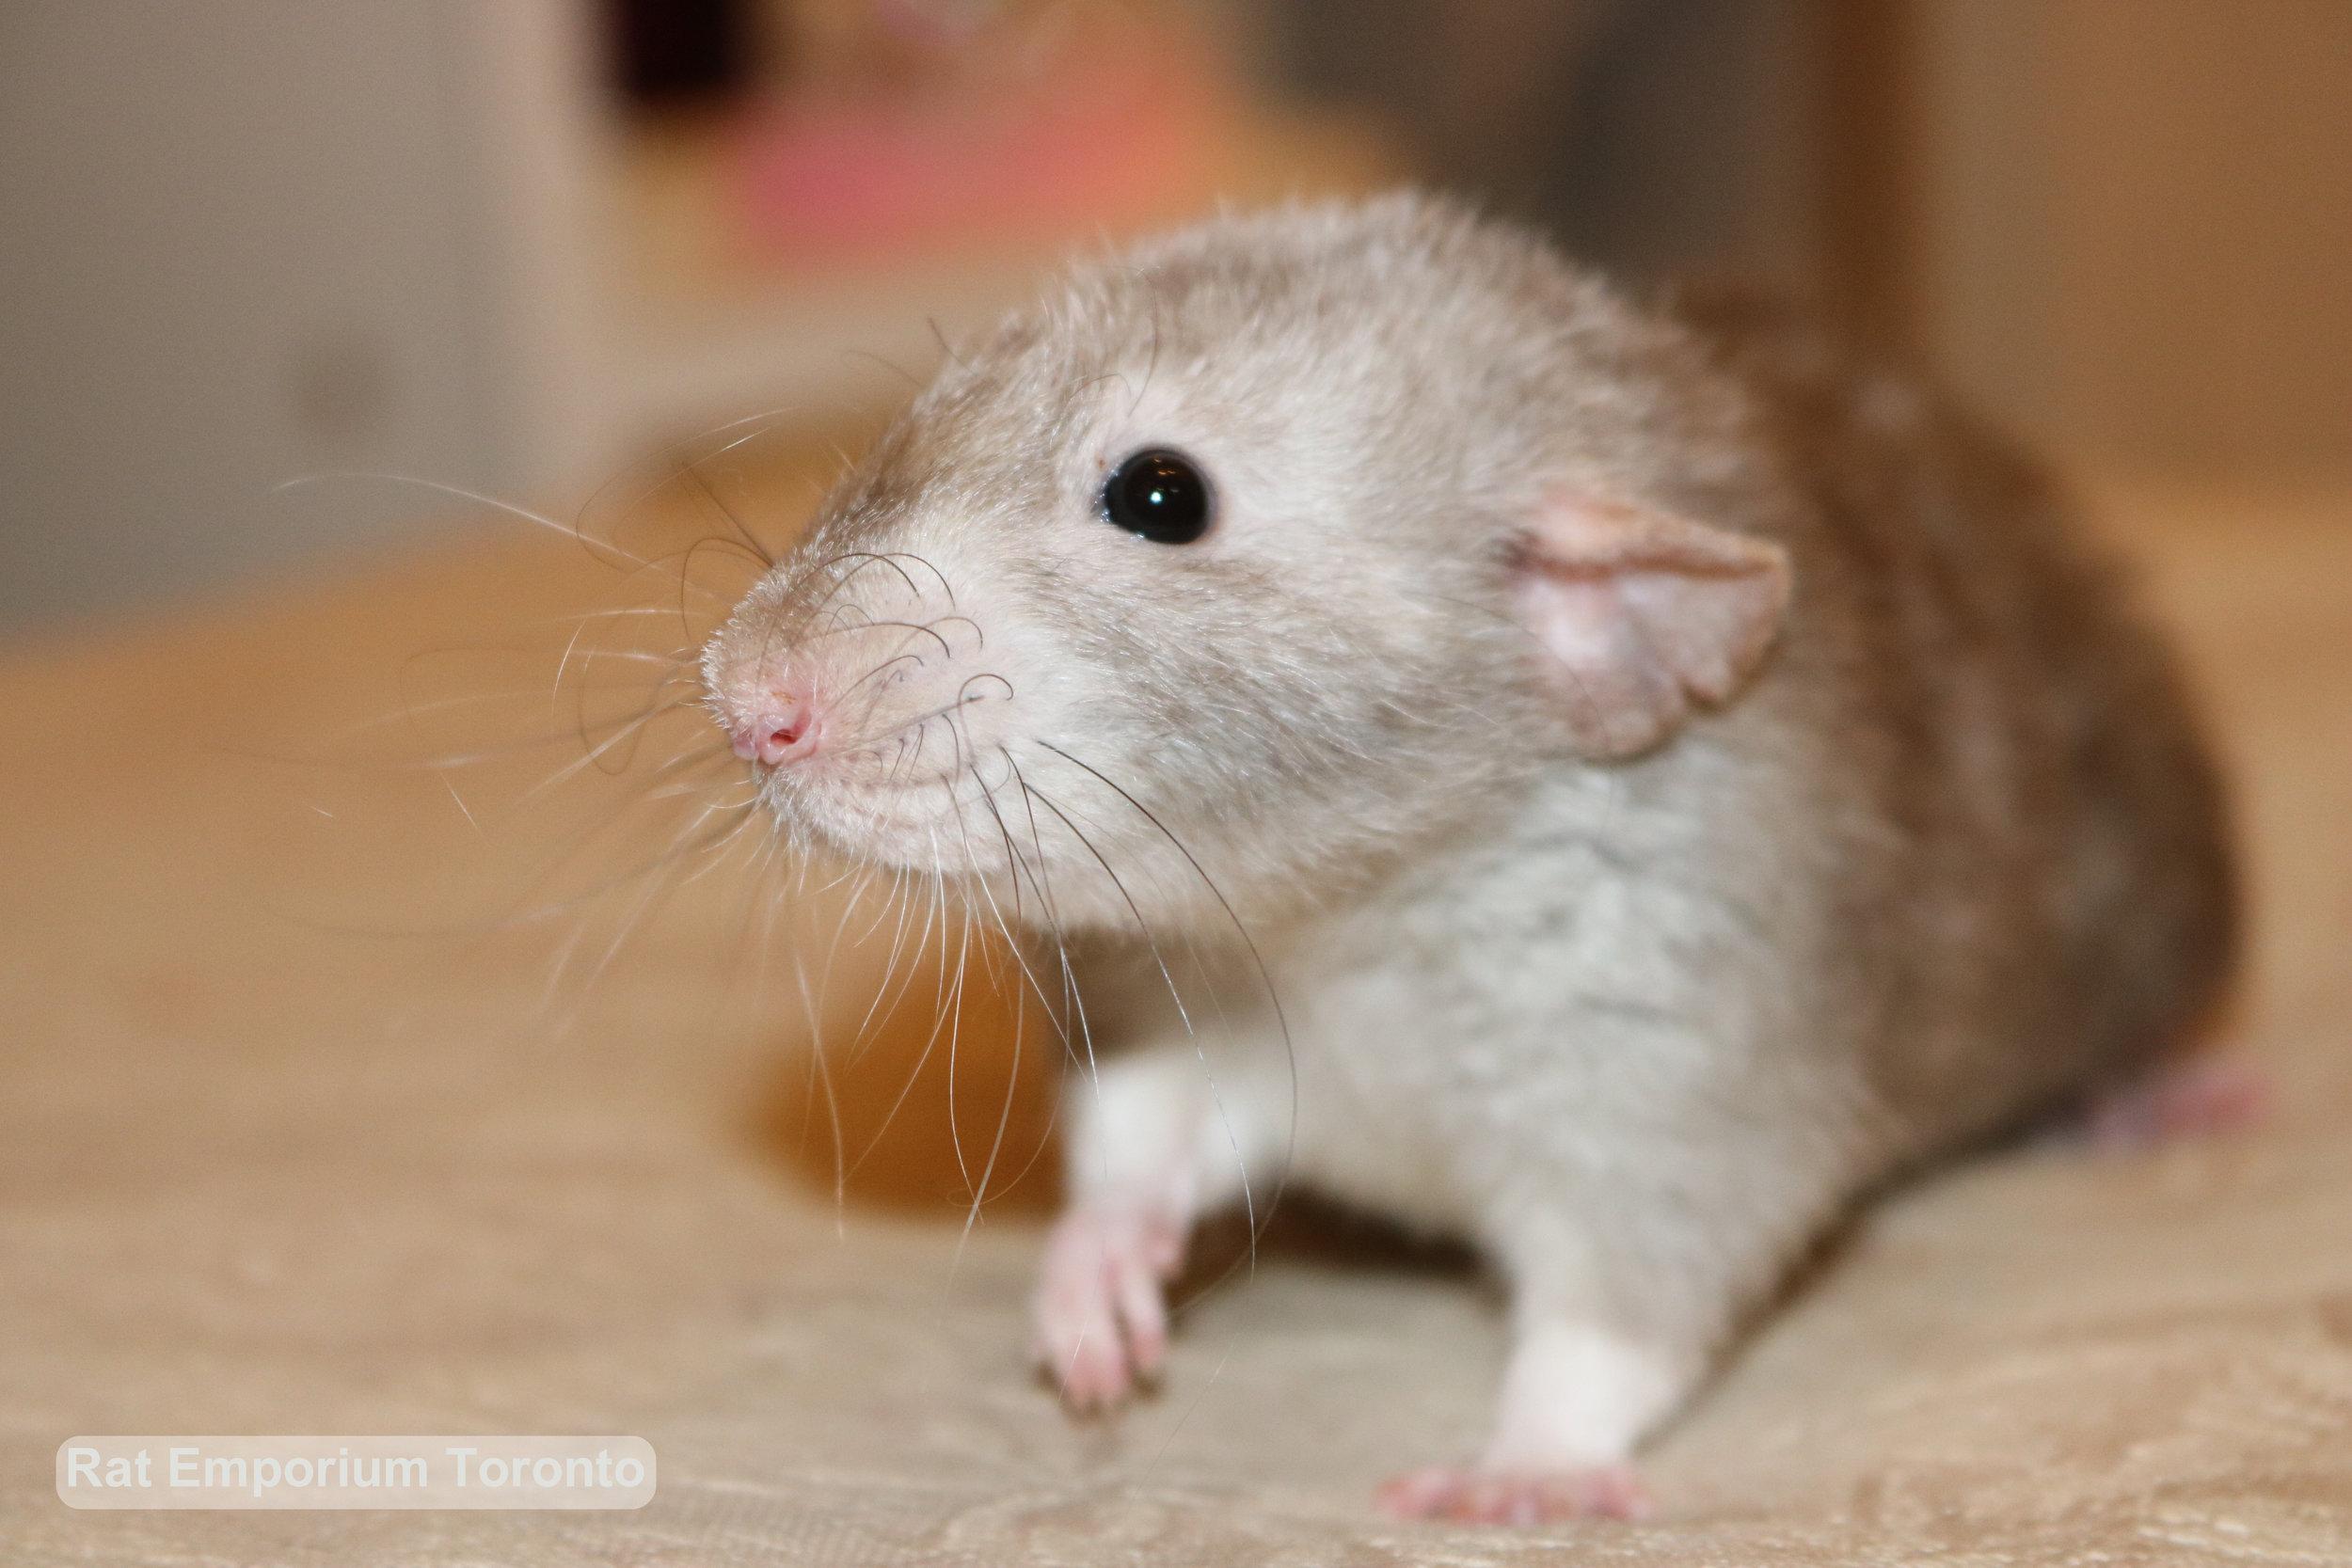 Daze - female black eyed marten dumbo velveteen rat -born at the Rat Emporium Toronto, a Toronto based pet breeder - Adopt pet rats - Toronto, Ontario, Canada - Toronto Rats